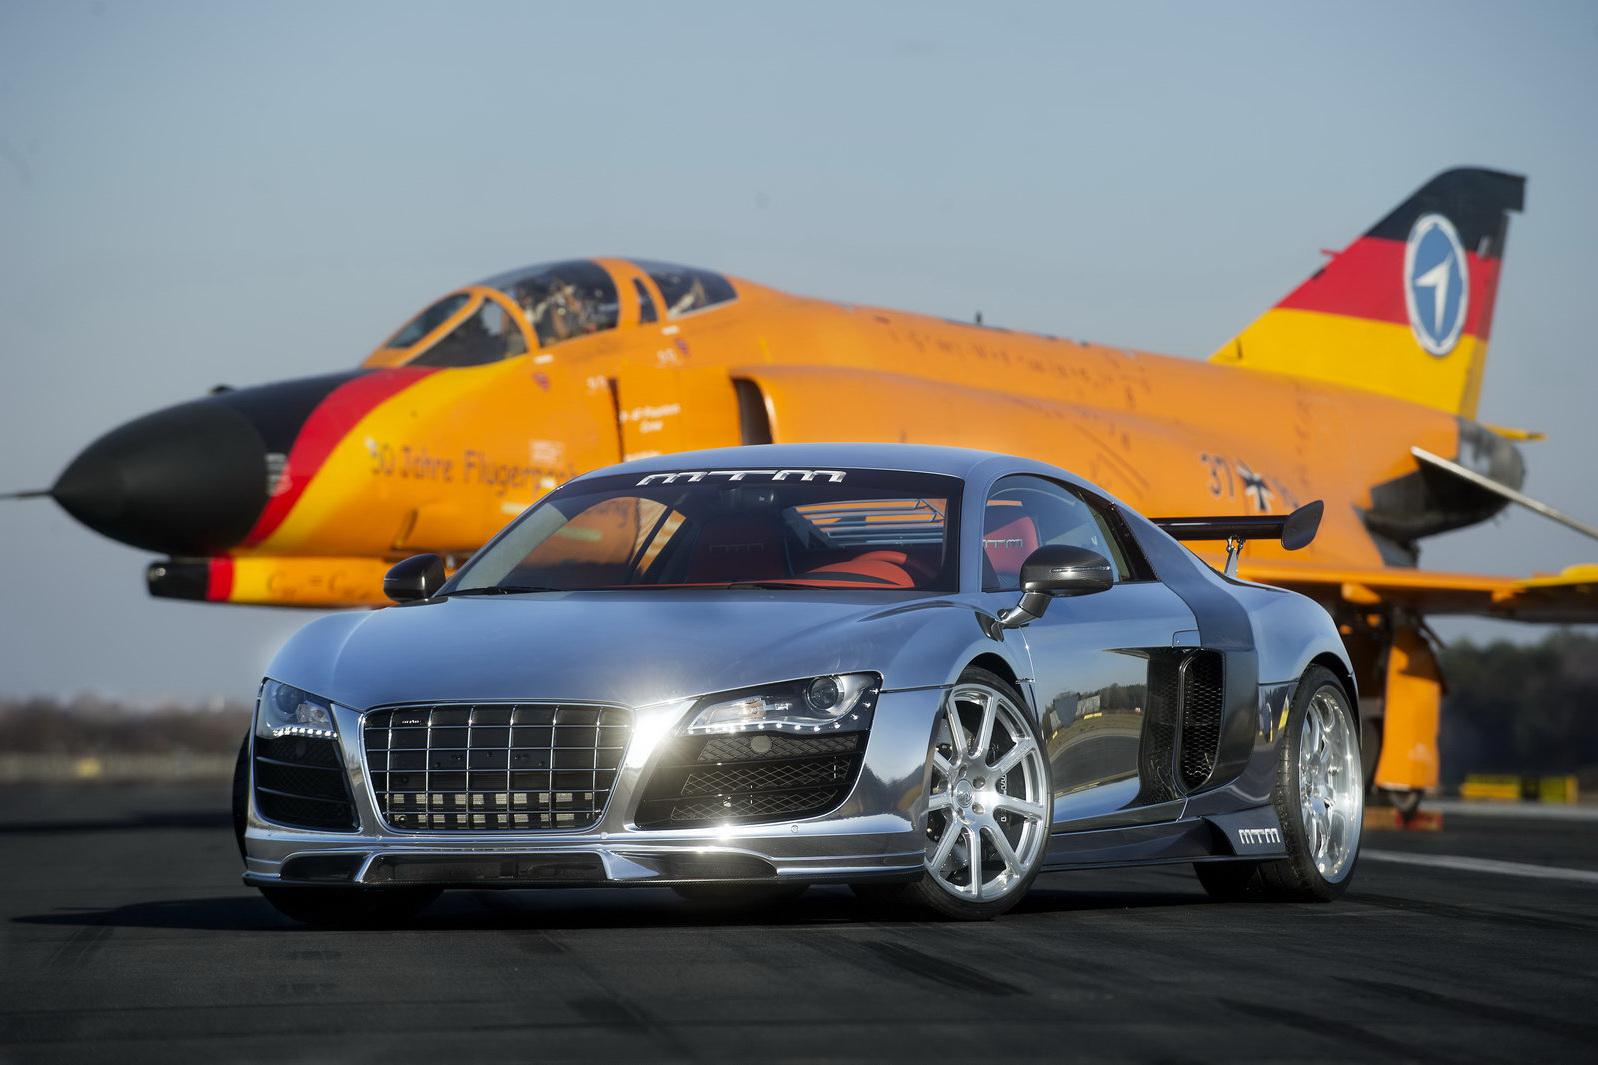 https://3.bp.blogspot.com/-EeSOVa1DPxM/TgjyuVpOoQI/AAAAAAAAA6E/T3PUtiUfwzQ/s1600/MTM-Audi-R8-V10-1.jpg